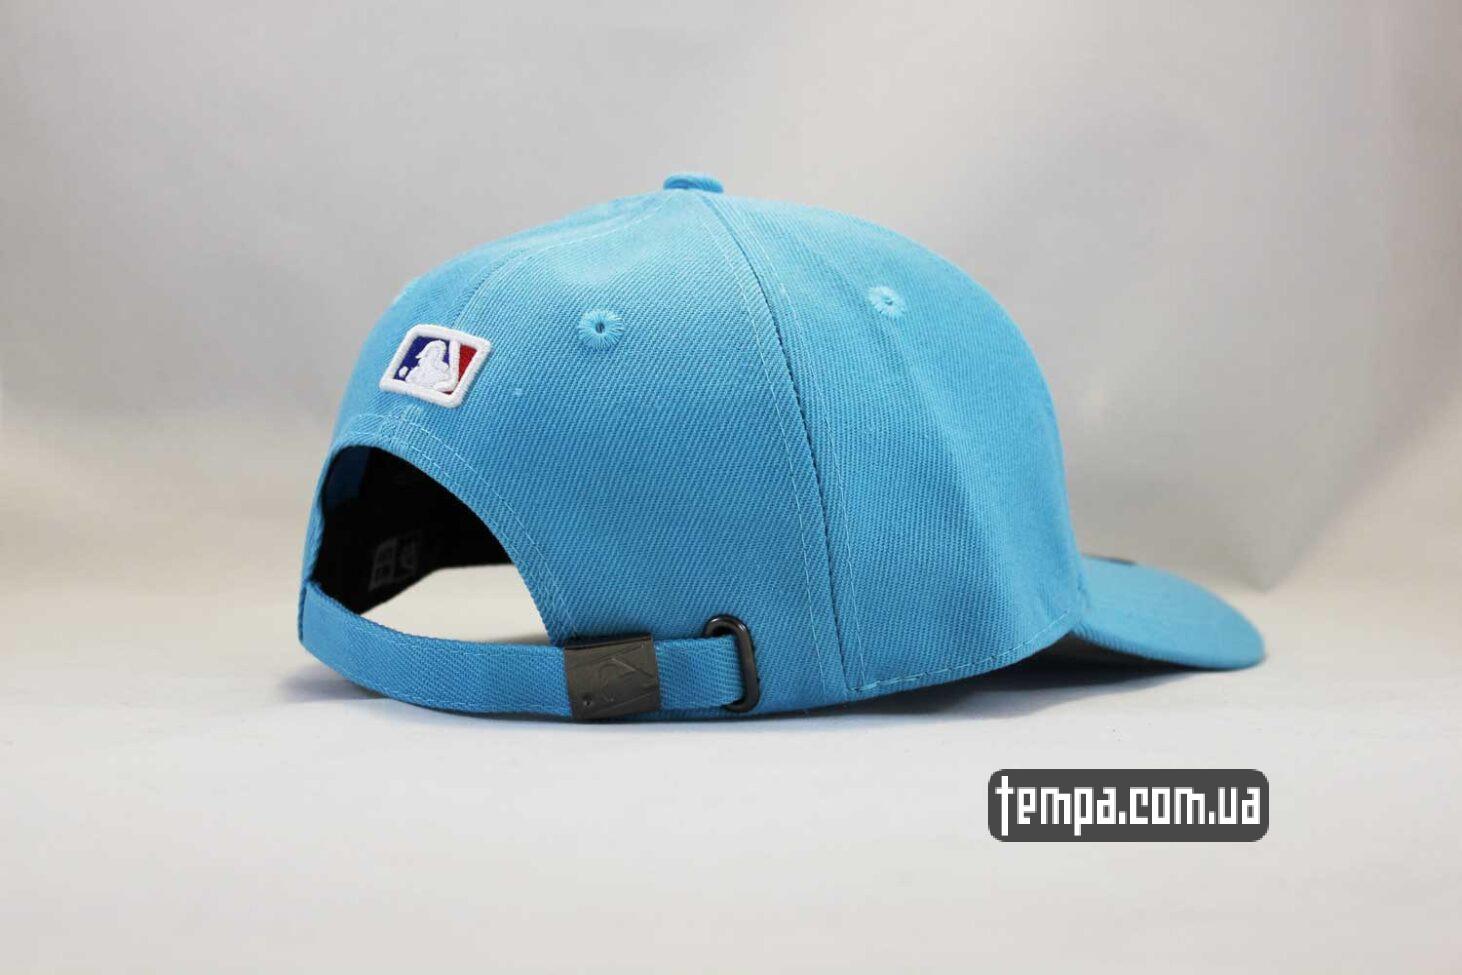 янкис оригинал кепка бейсболка snapback New Era New York Yankees голубая купить